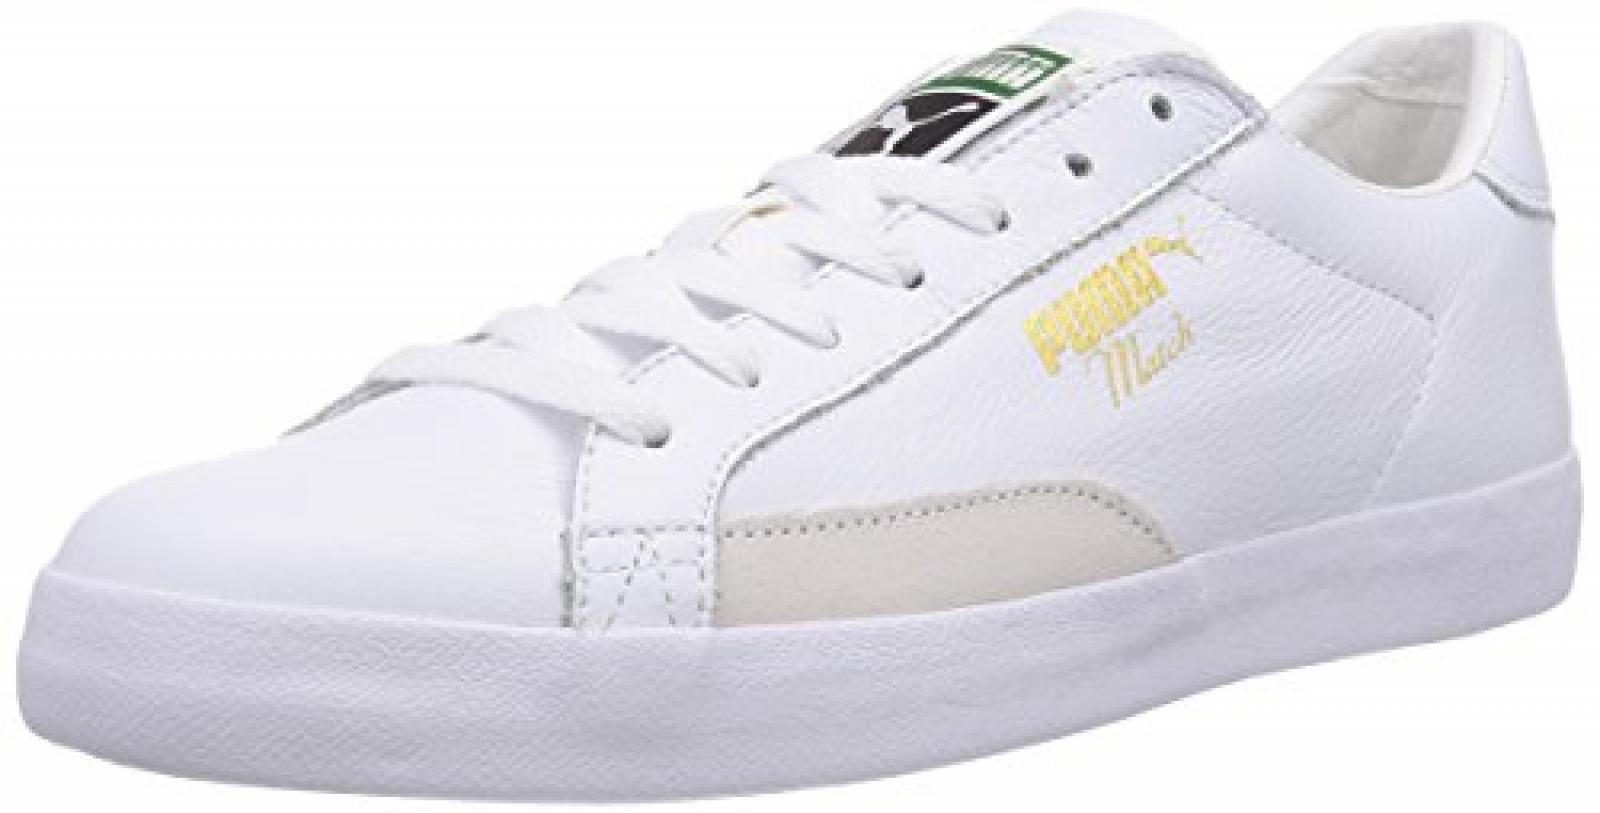 Puma Match Vulc Unisex-Erwachsene Sneakers